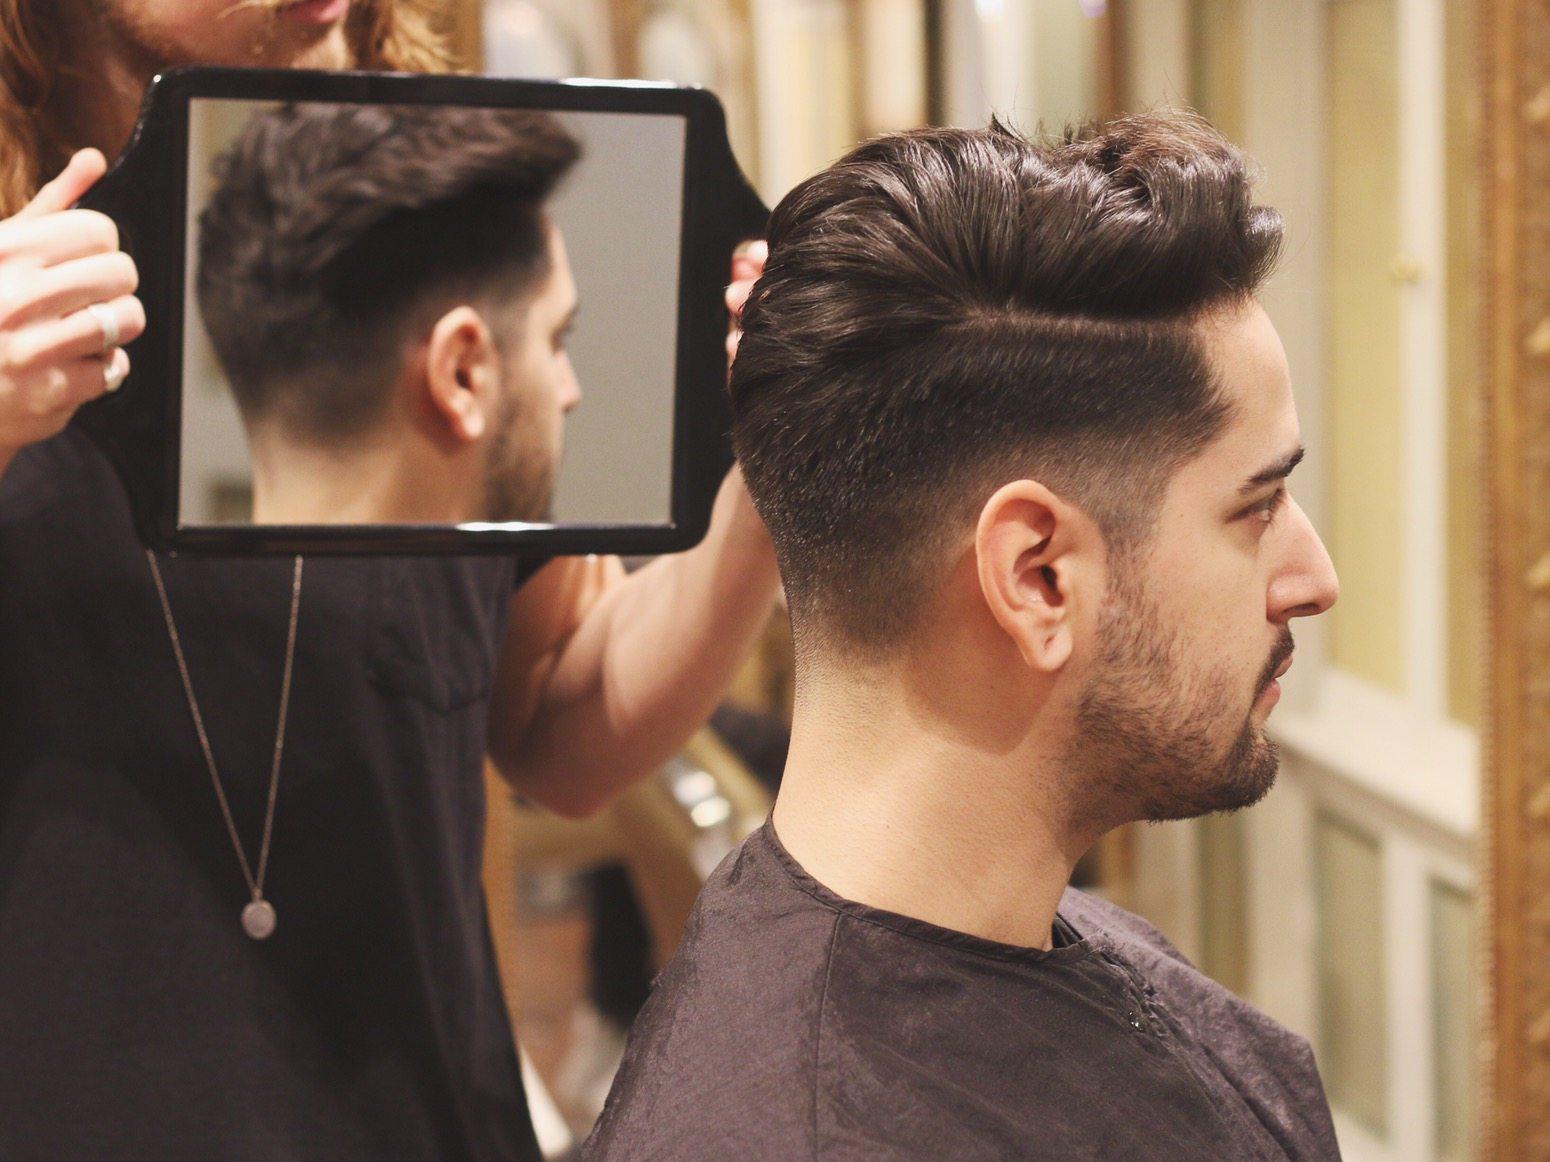 Hairstyles with quiff - Hairstyles With Quiff 48